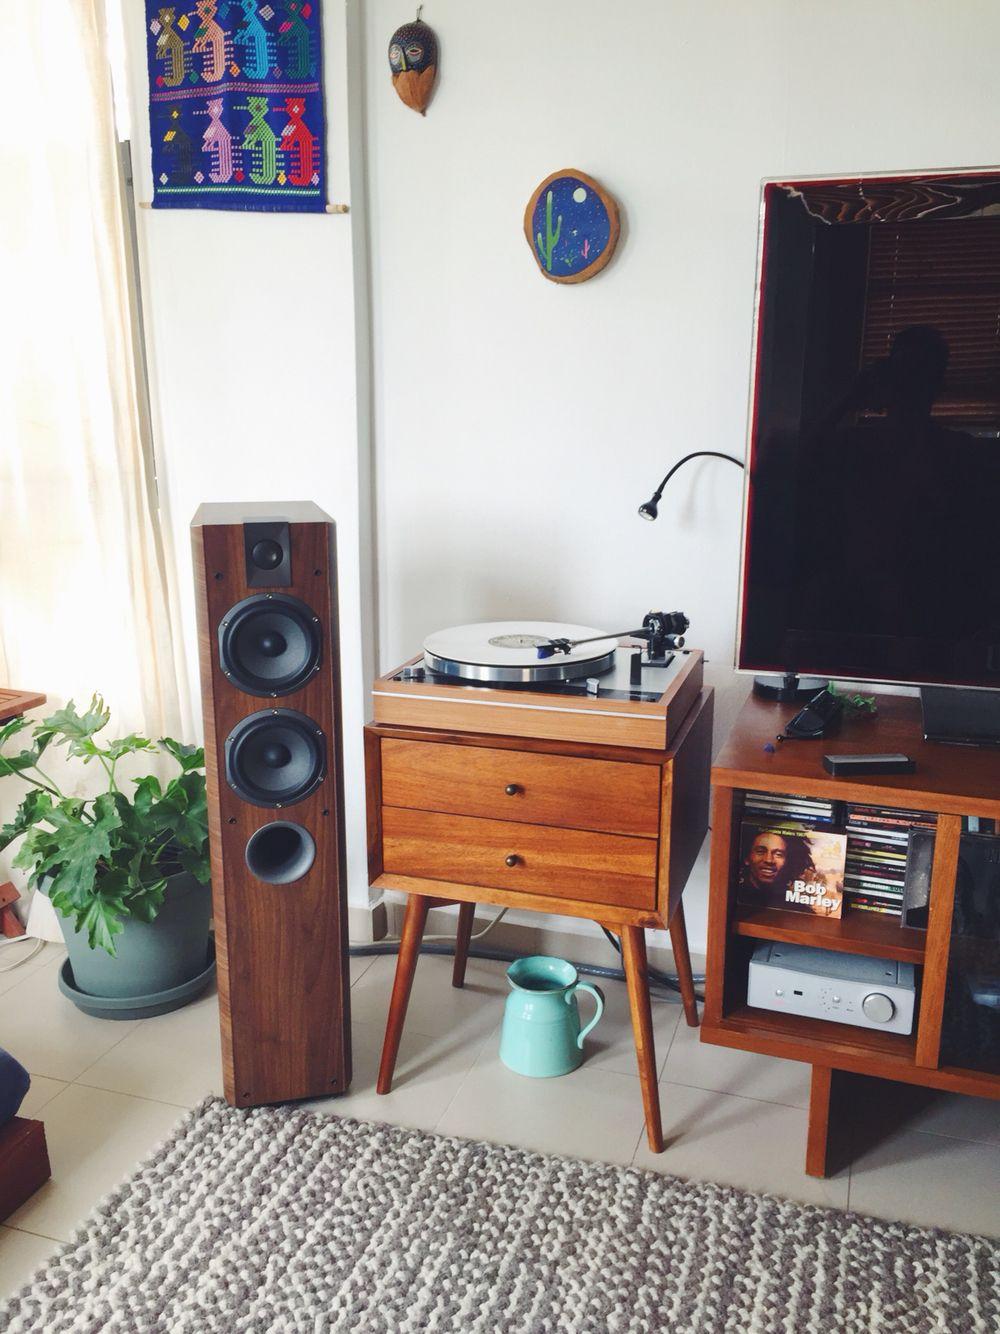 Thorens TD 160 turntable Focal Chorus 714 Rega Brio r Hifi stereo